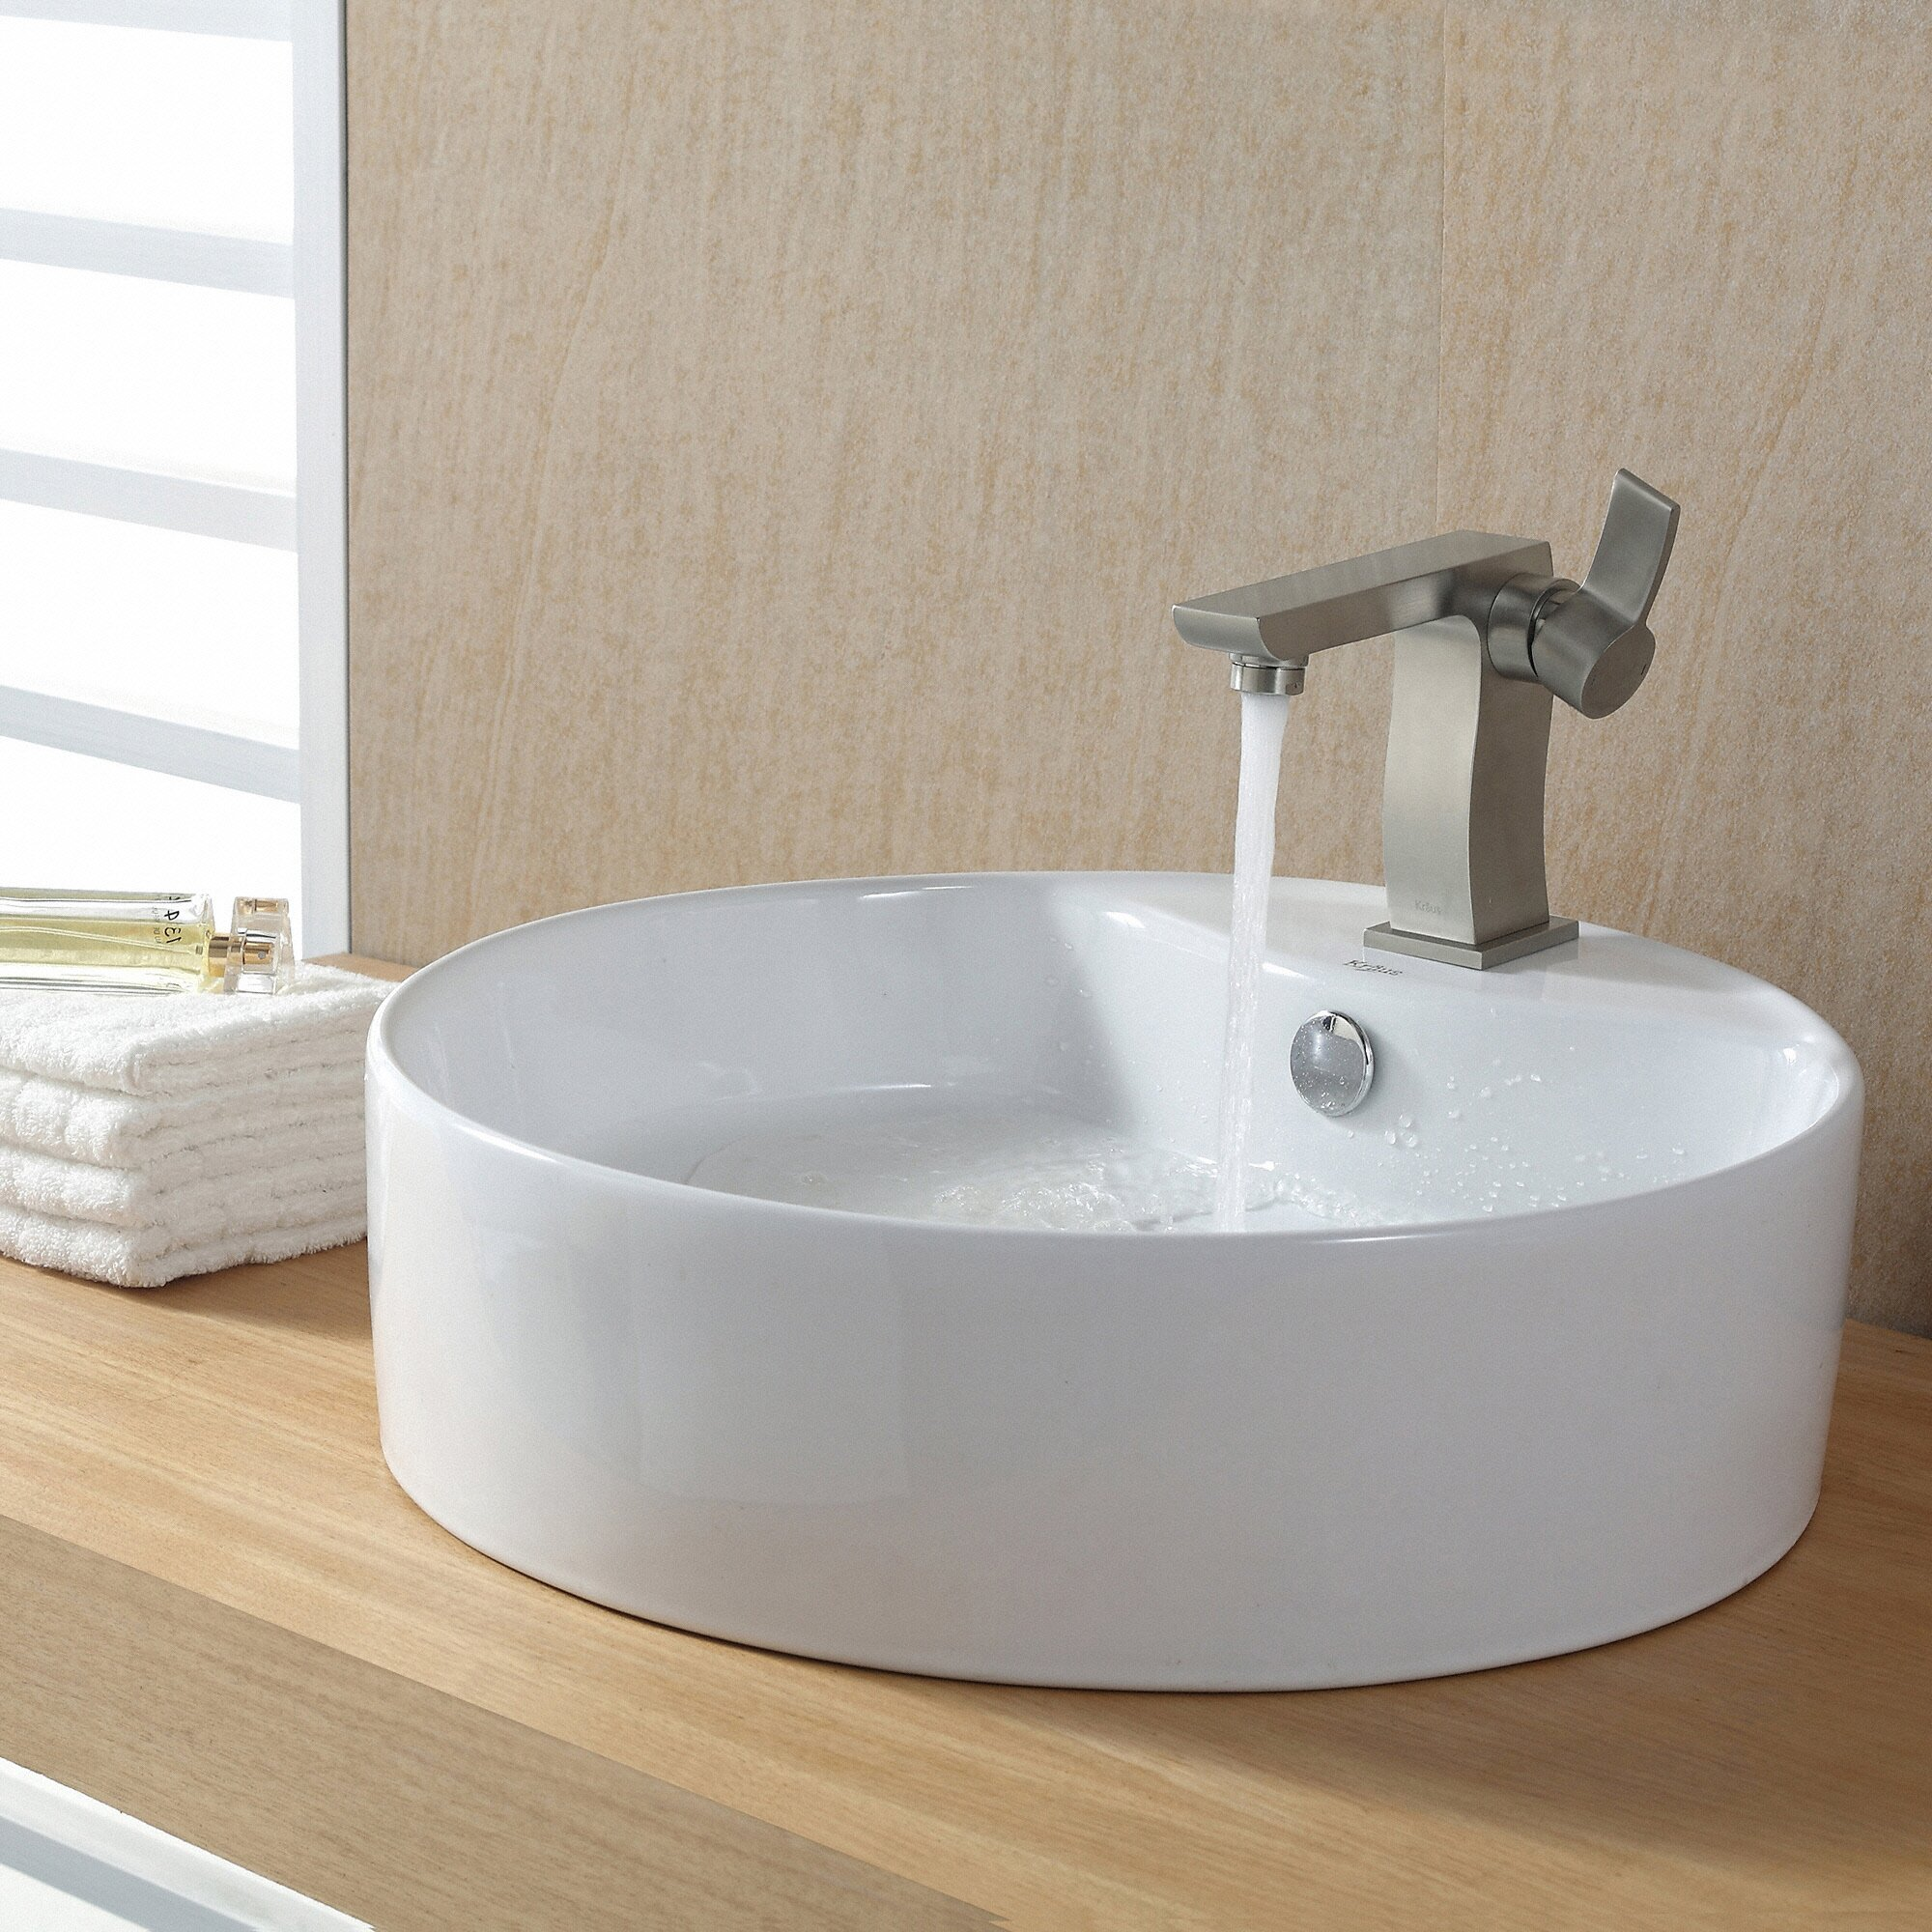 kraus ceramic round sink reviews wayfair. Black Bedroom Furniture Sets. Home Design Ideas